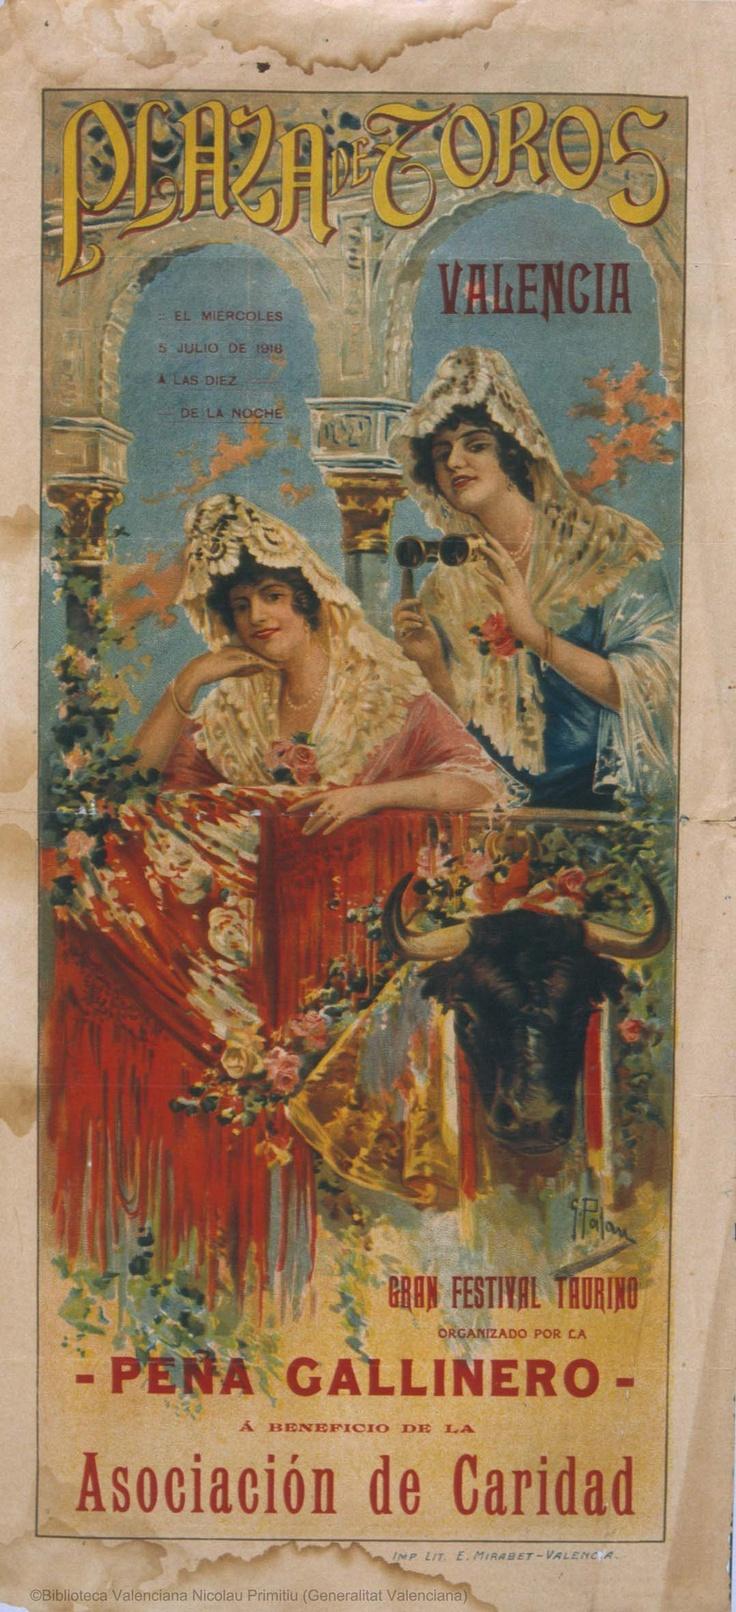 Plaza de Toros Valencia : El miercoles 5 julio de 1916 ... : Gran festival taurino ... [S.l. : s.n., 1916?] (Valencia : E. Mirabet). 1 lám. (cartel) : col. ; 49 x 22 cm